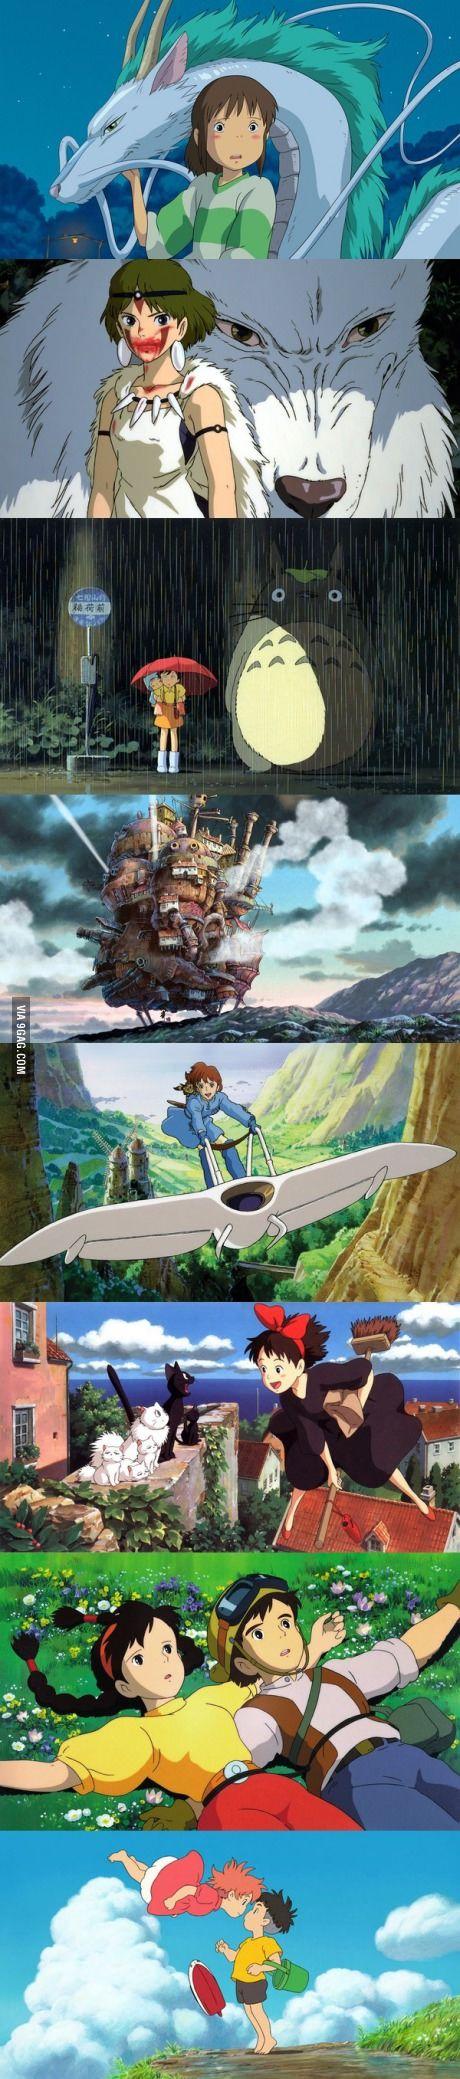 To those posting images about the best anime, I raise you these Miyazaki & Hisaishi masterpieces.